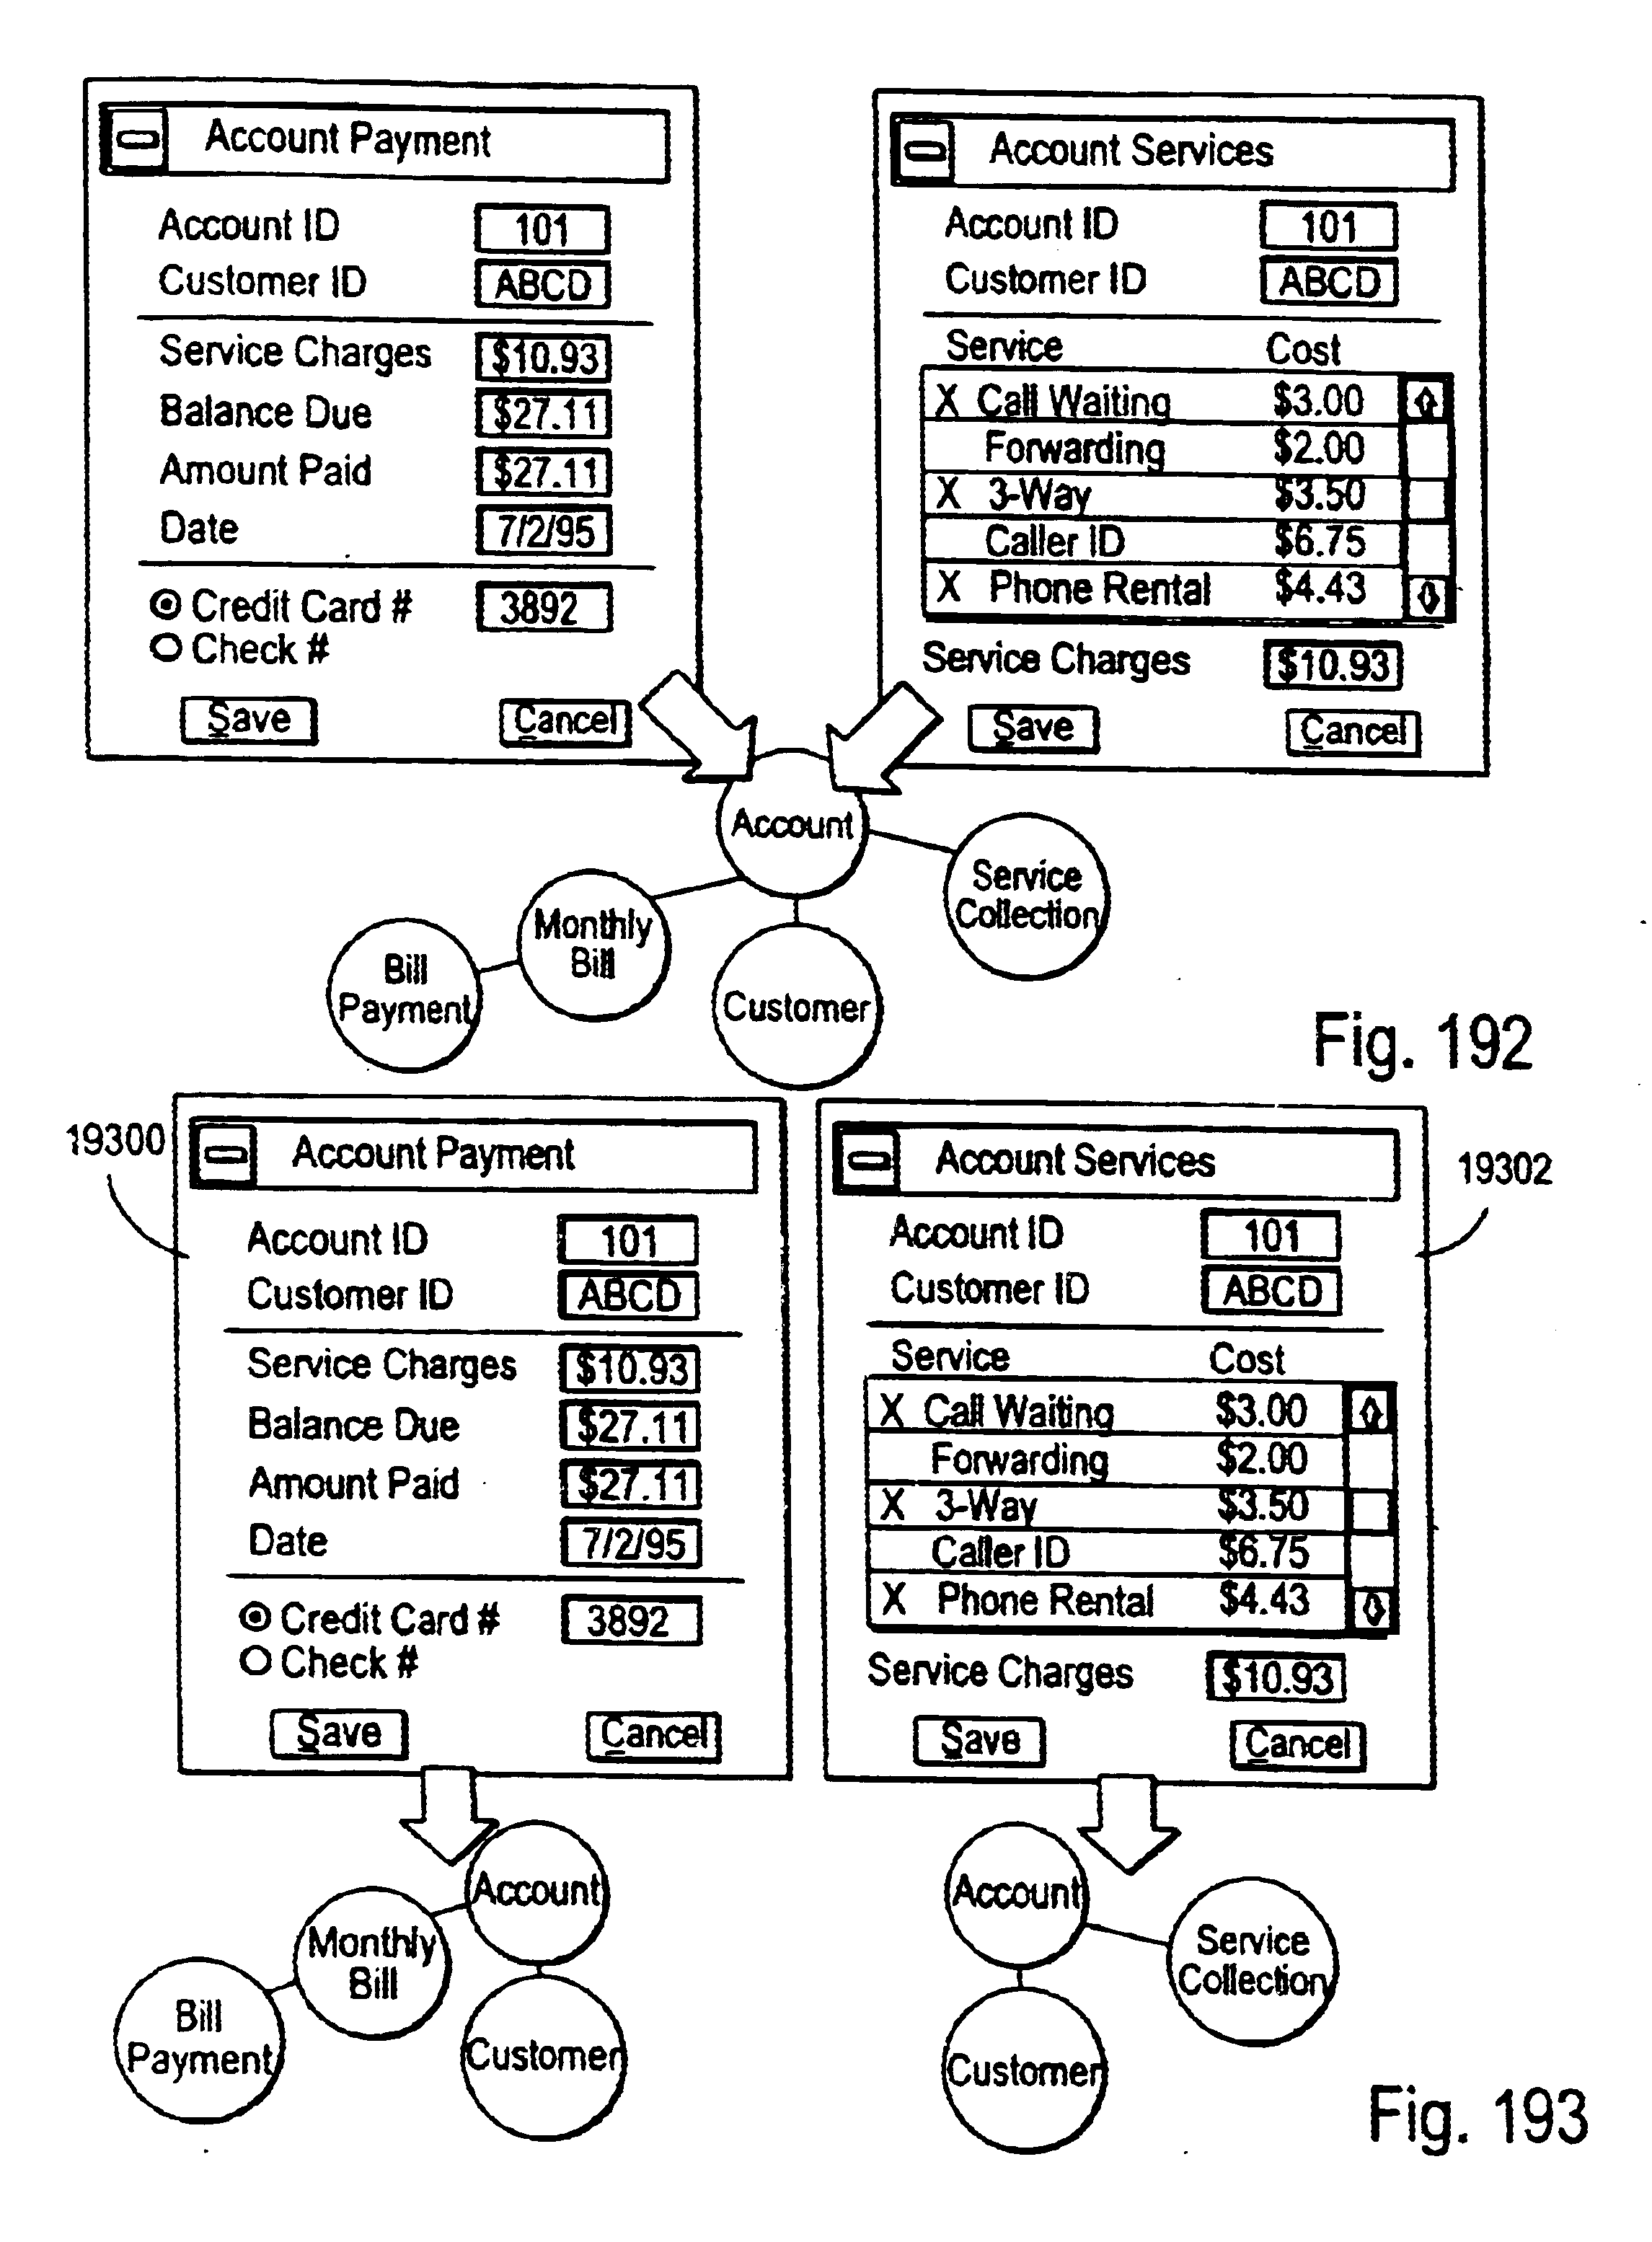 Patent US 6,640,238 B1